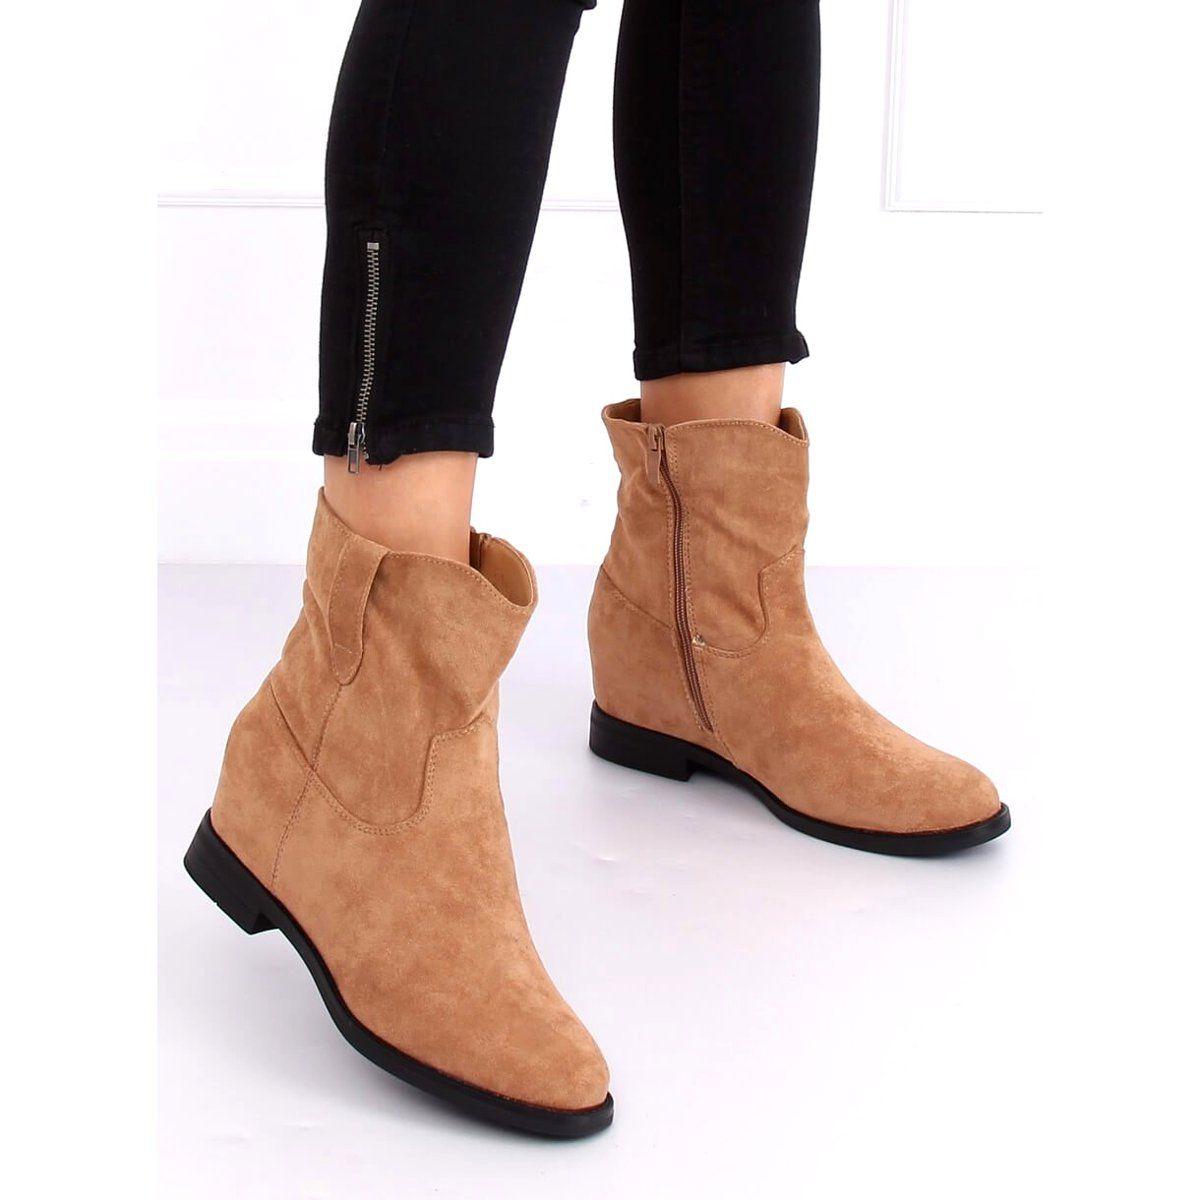 Botki Na Ukrytym Koturnie Bezowe G 7605 Khaki Bezowy Shoes Chelsea Boots Ankle Boot